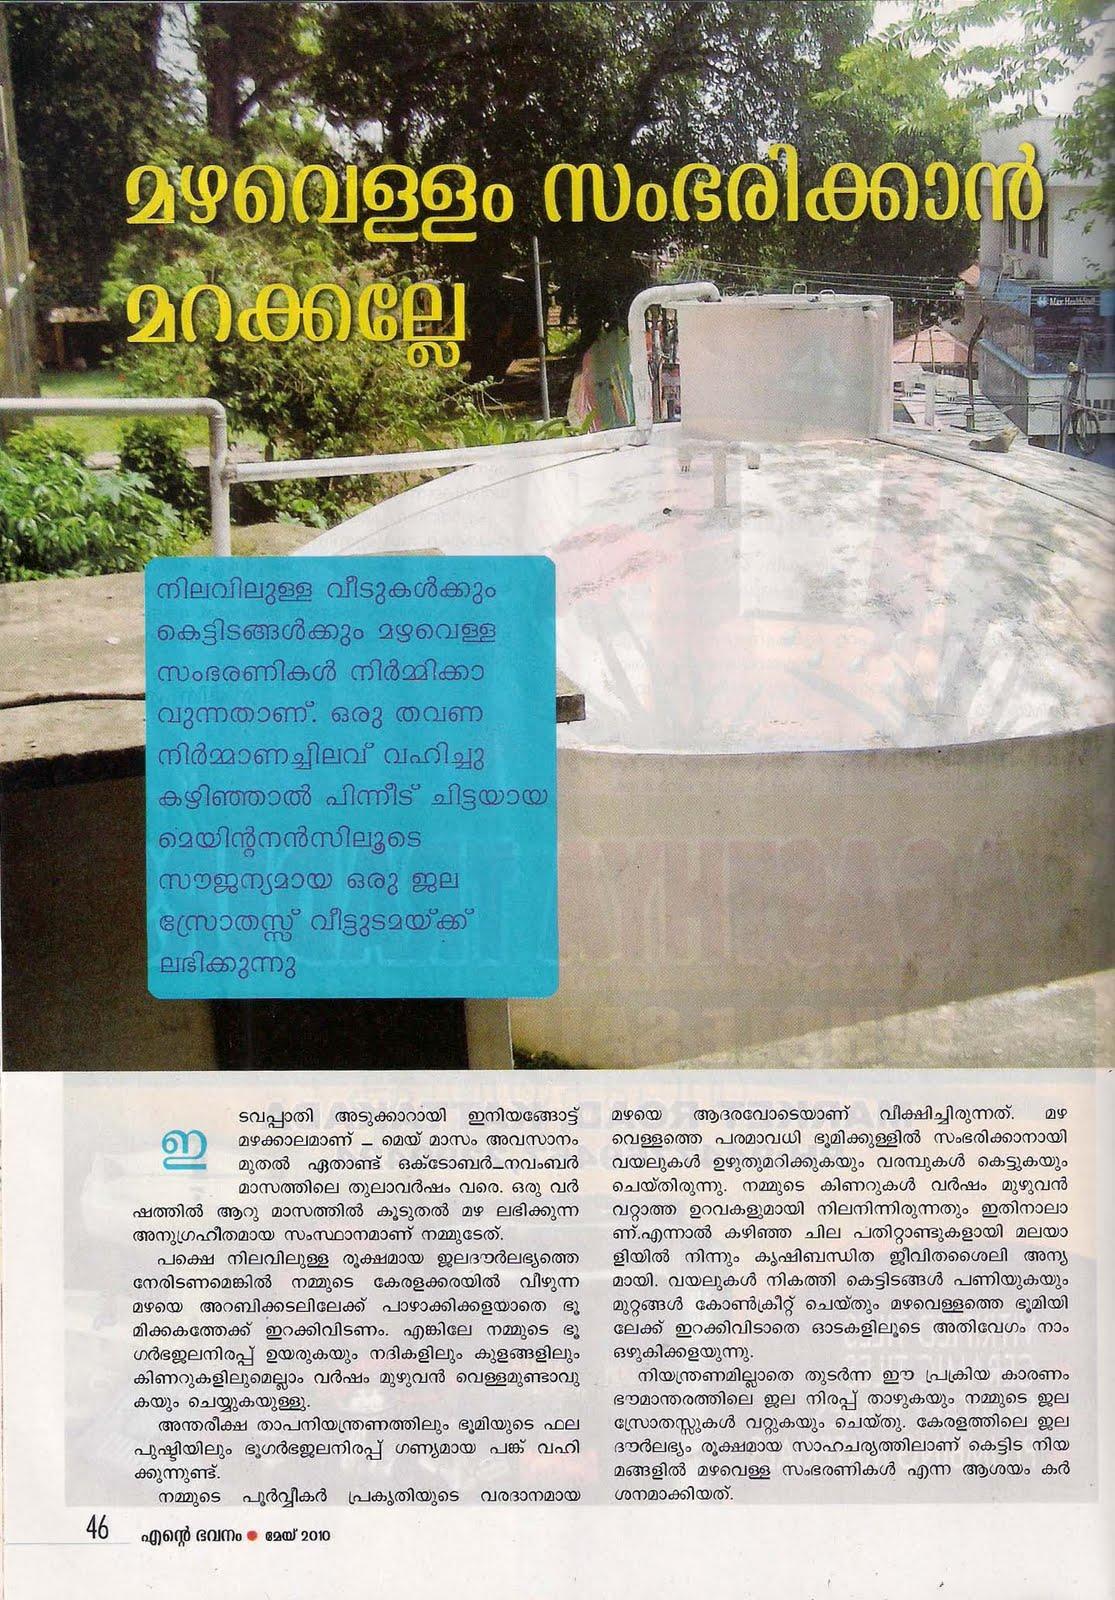 keralahousedesigner com malayalam article on rainwater harvesting please click on image to enlarge